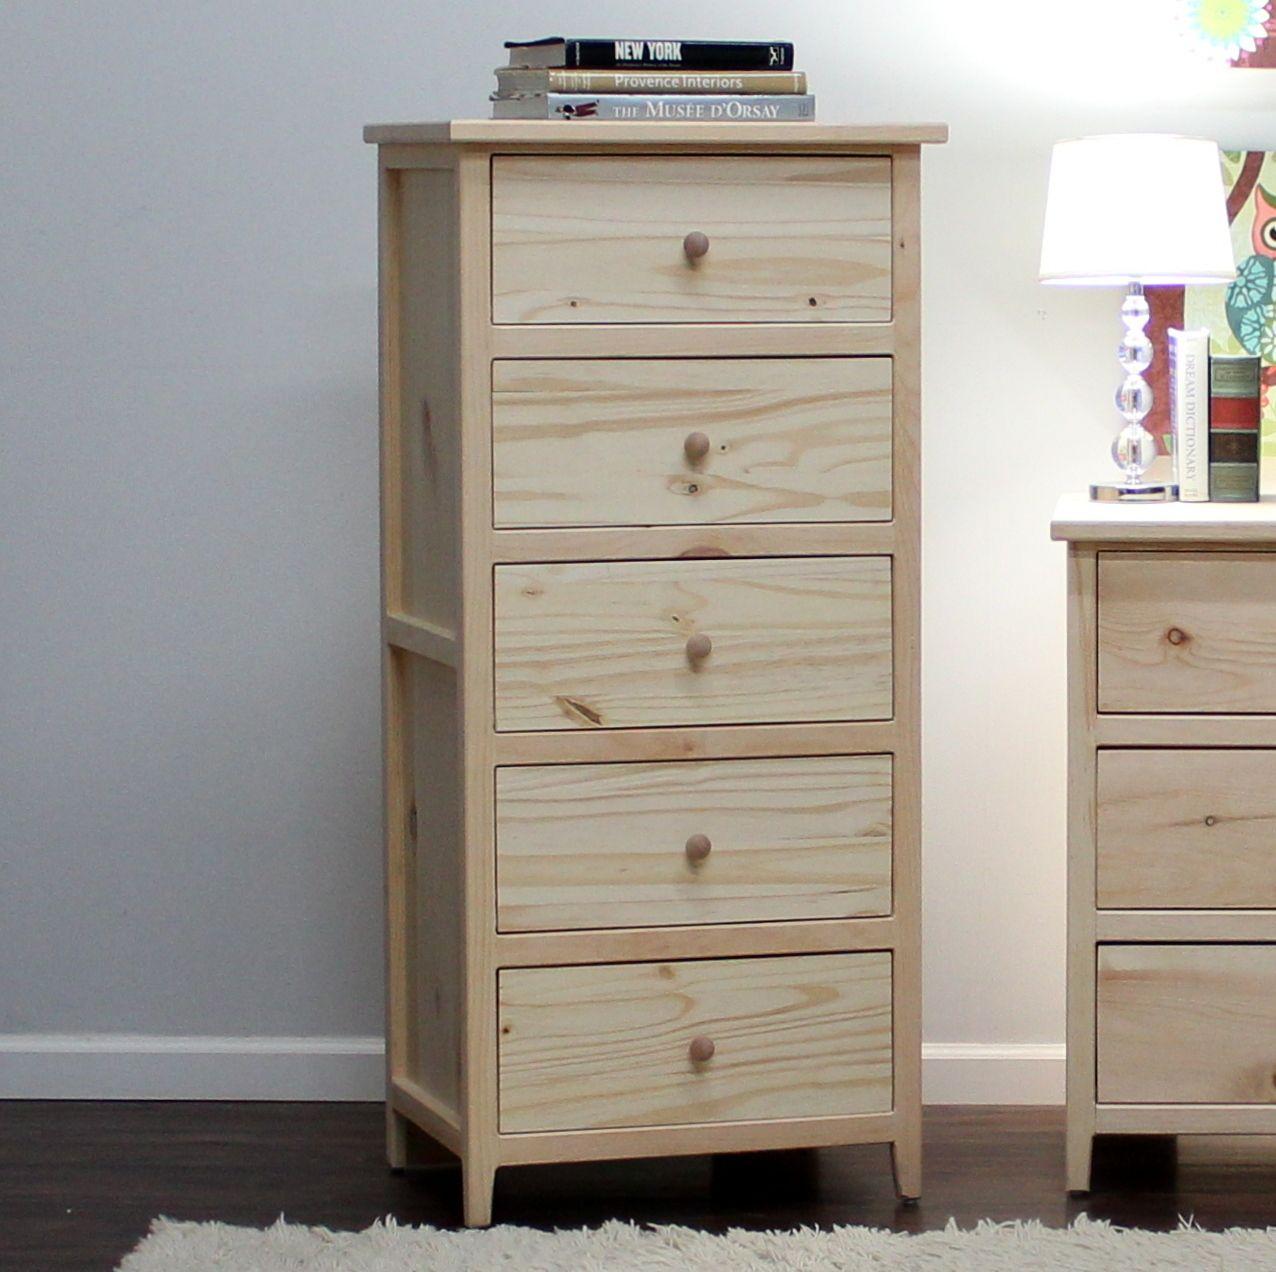 Little Neck Five Drawer Chest 18 X 24 X 52 Pine Wood Dresser Decor Tall Nightstand Skinny Dresser